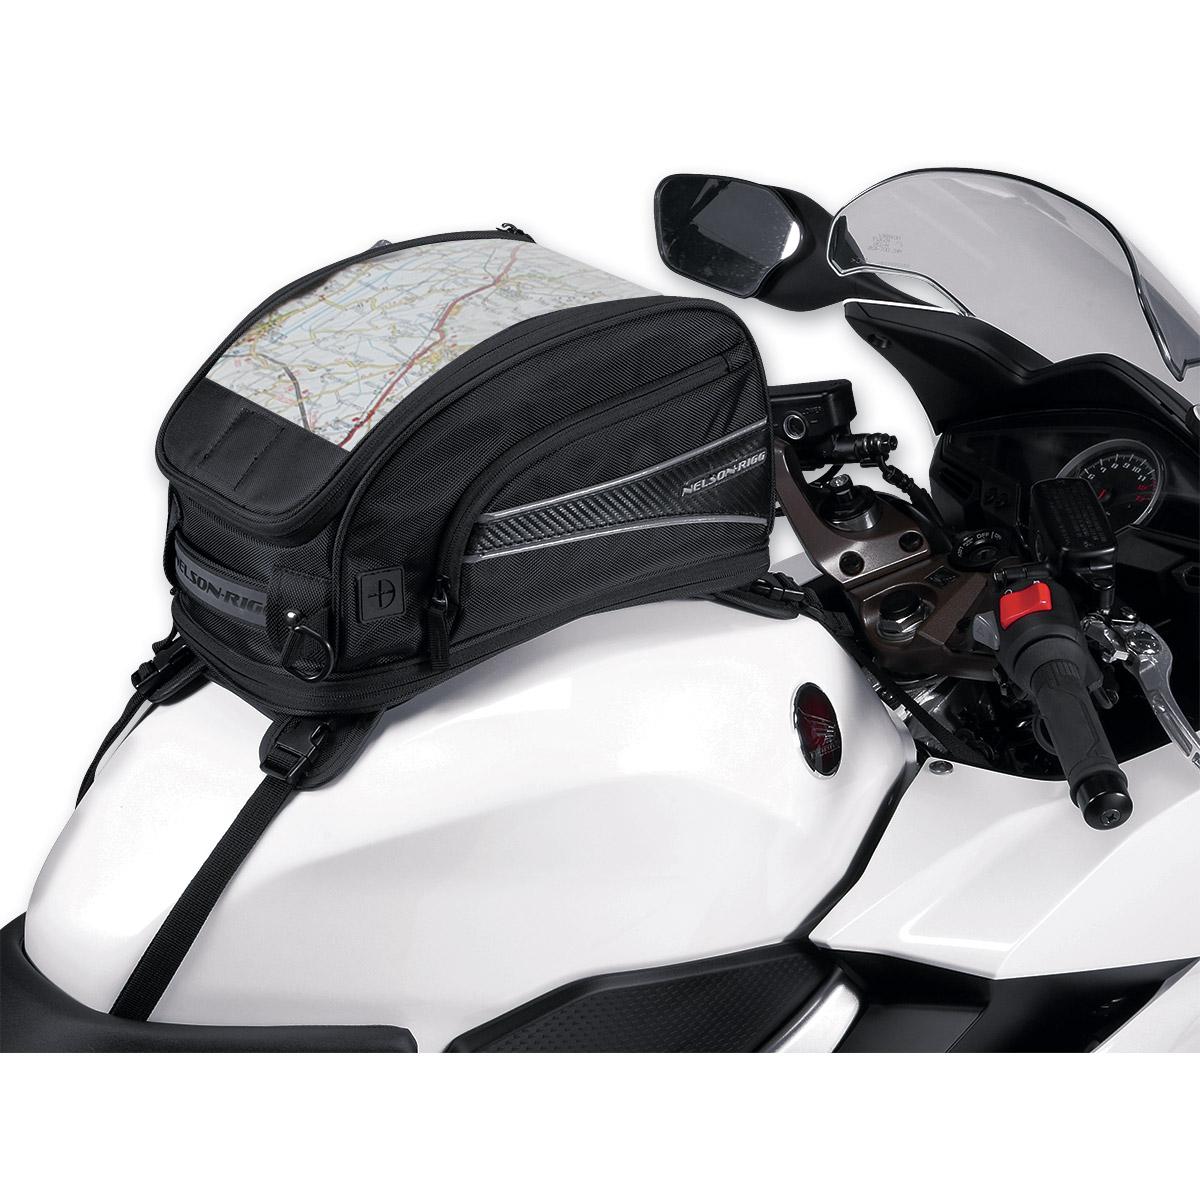 Nelson-Rigg CL-2015-ST Journey Sport Tank Bag Strap Mount